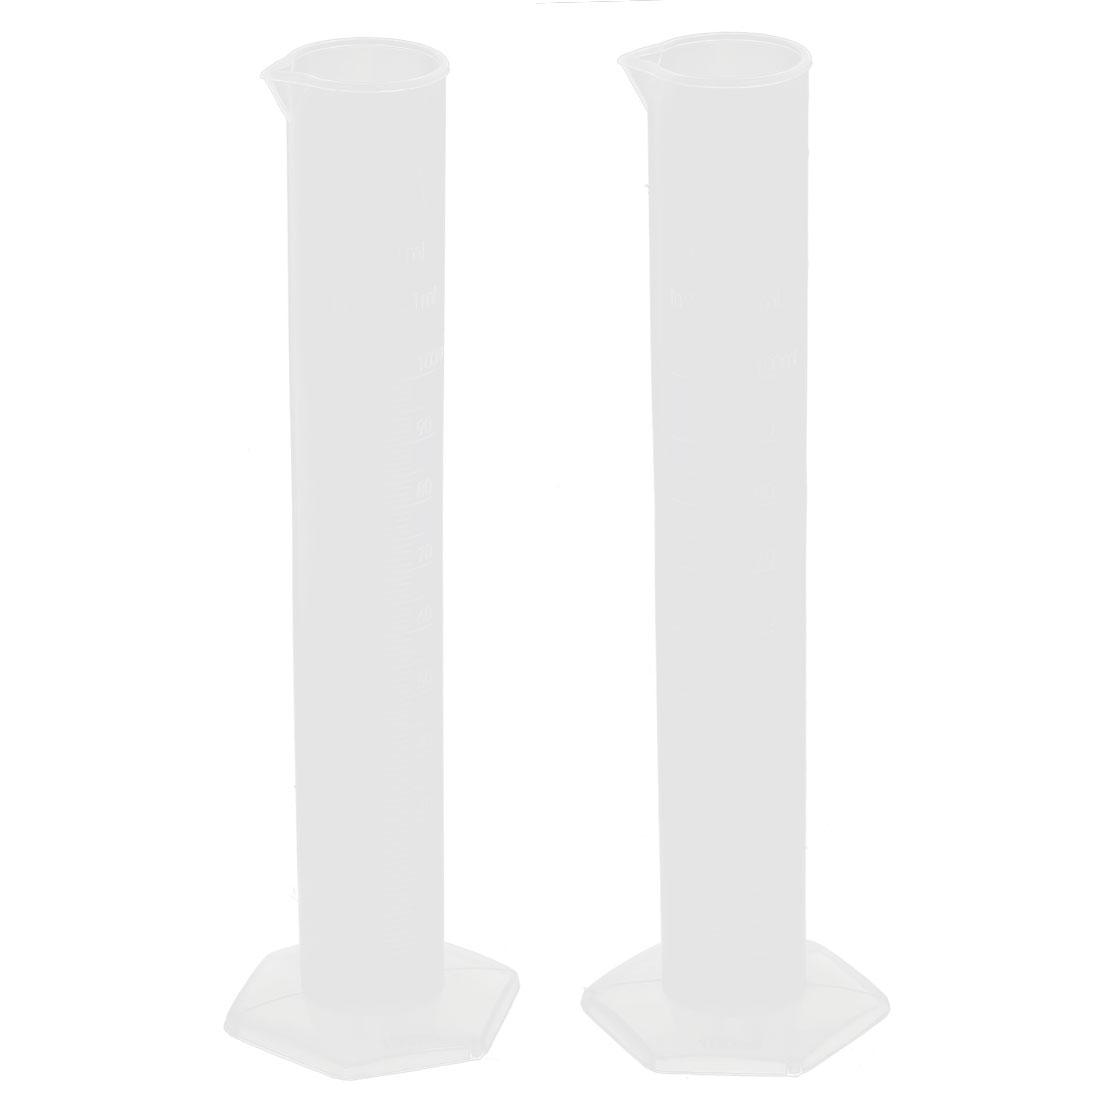 Lab Test 100ml Transparent Plastic Graduated Cylinder Measuring Cup 2pcs